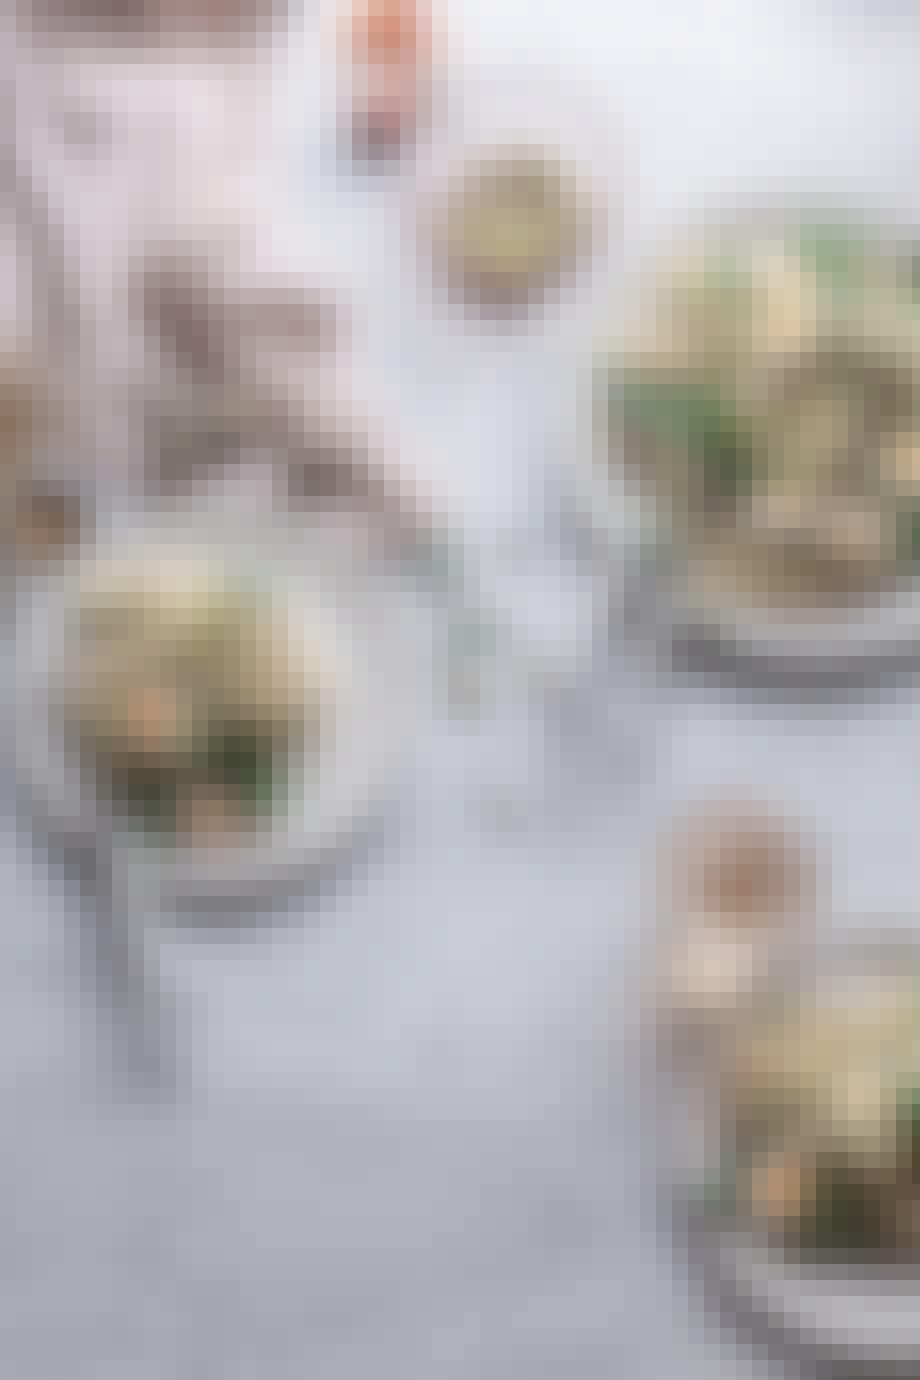 Quinoa salat med miso-vinaigrette og vagtelæg